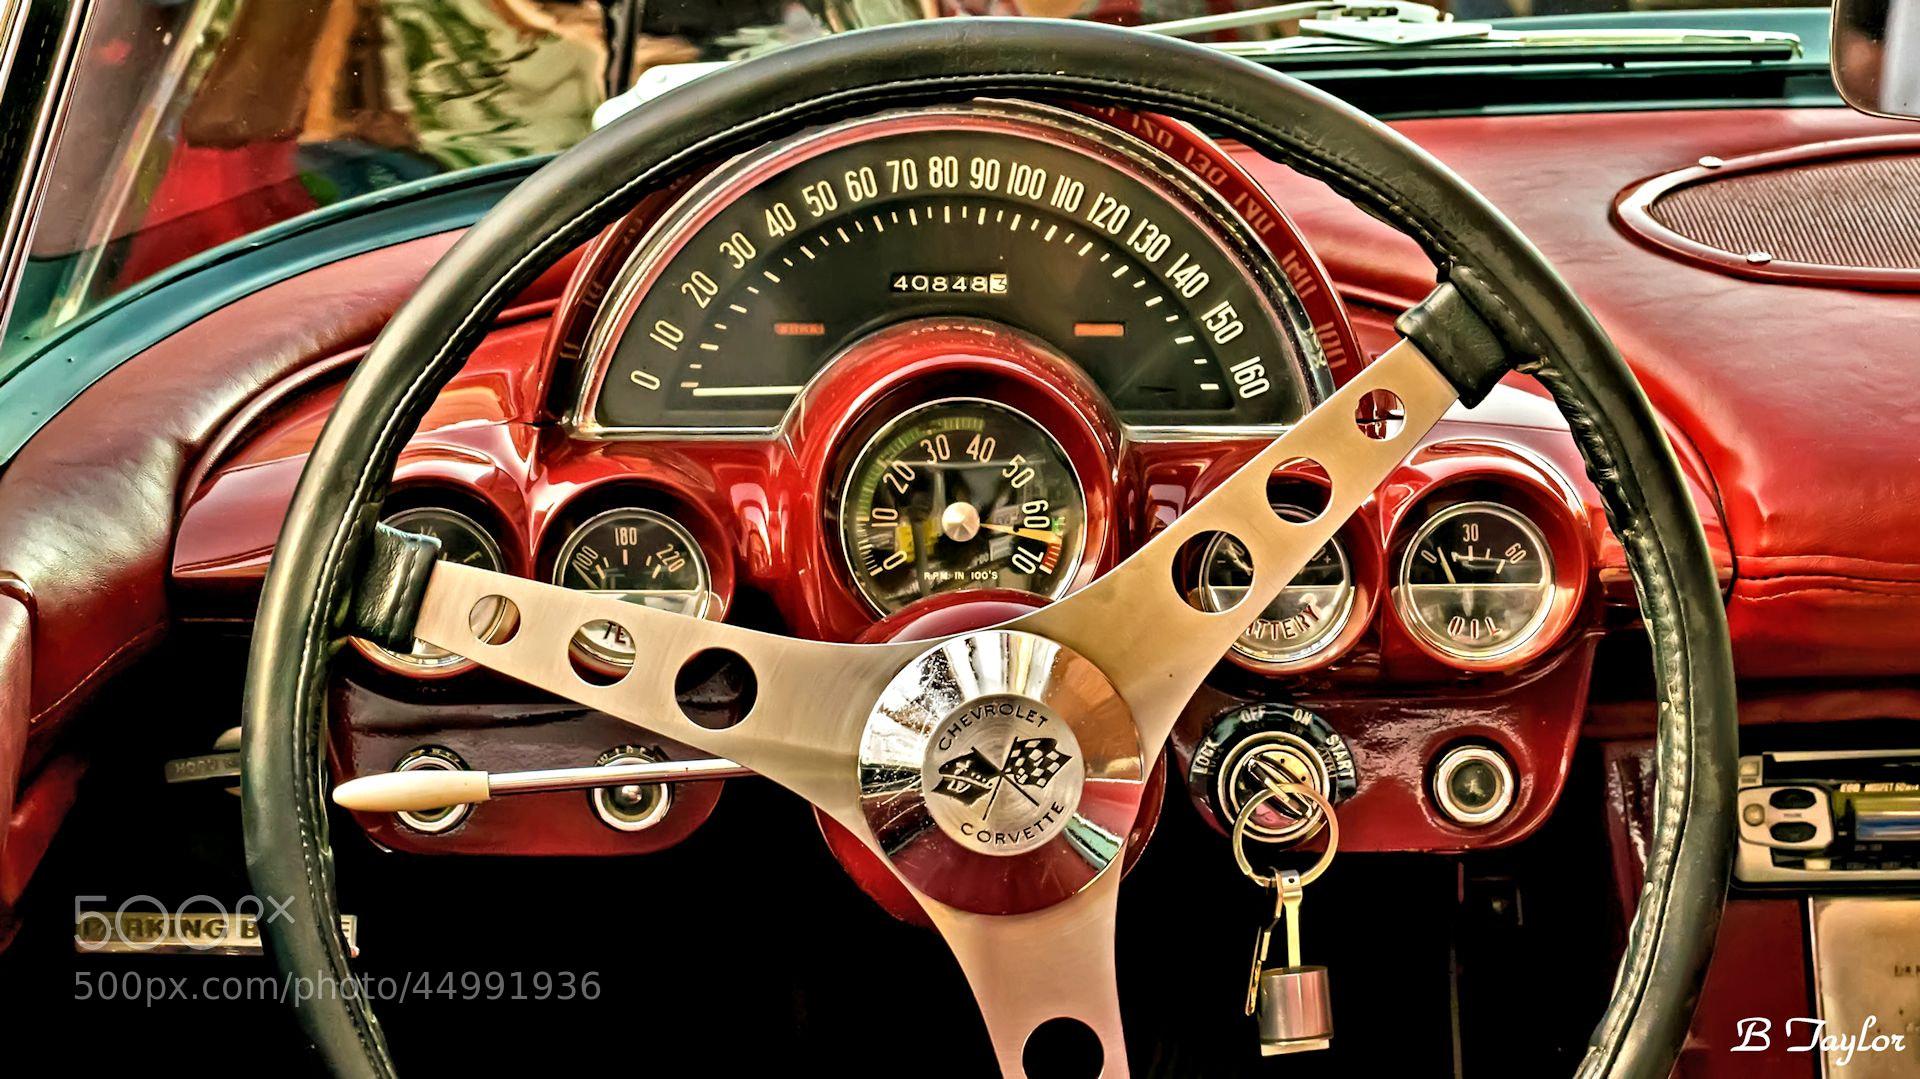 Photograph 1958 Corvette dash by Bradley Taylor on 500px